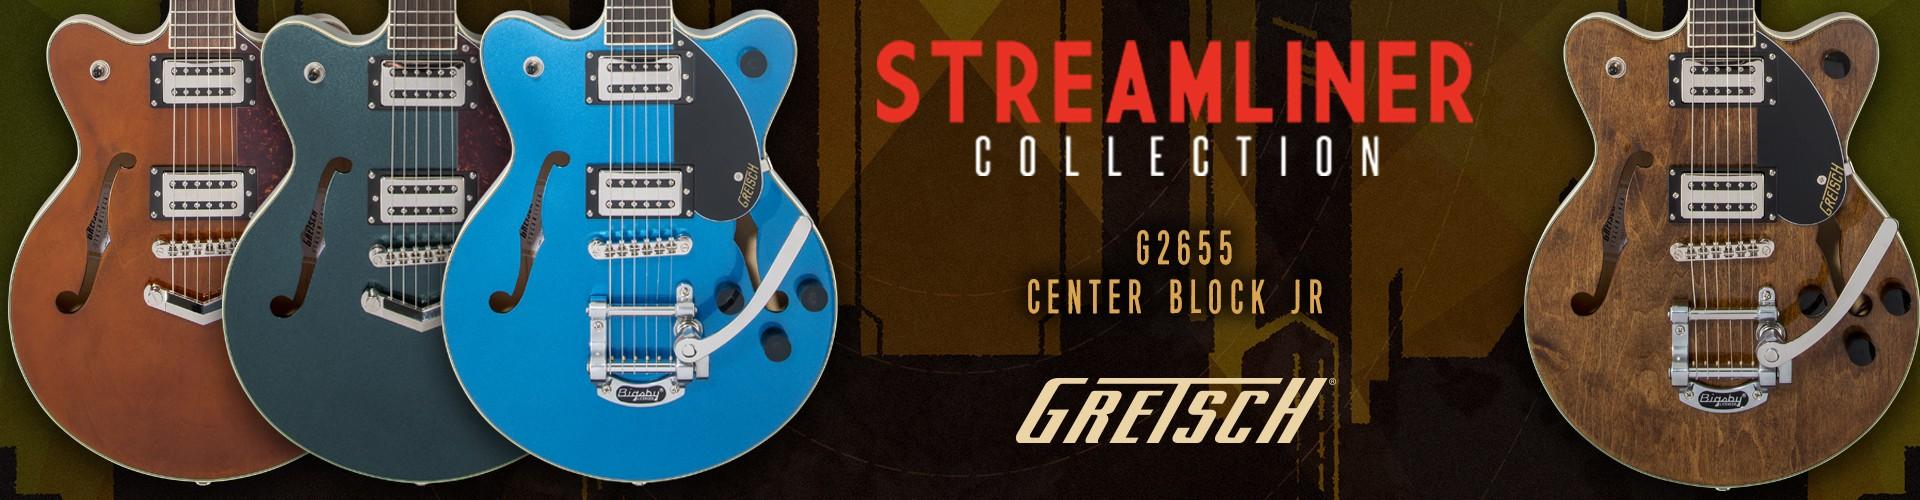 Gretsch Streamliner Collection Center Block Jr